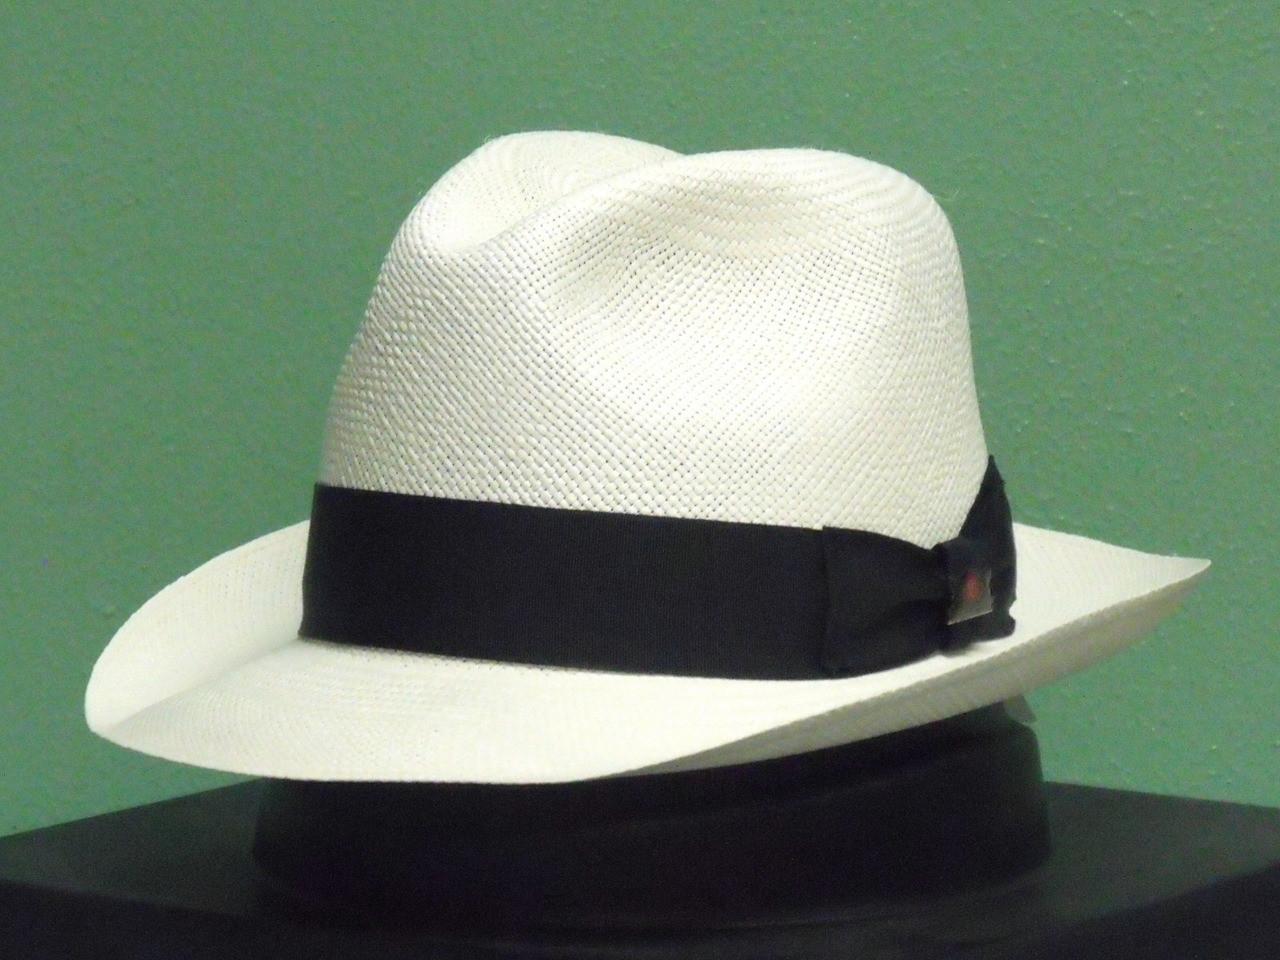 a1de21d13f768 Biltmore Havana Genuine Panama Straw Fedora Hat - One 2 mini Ranch